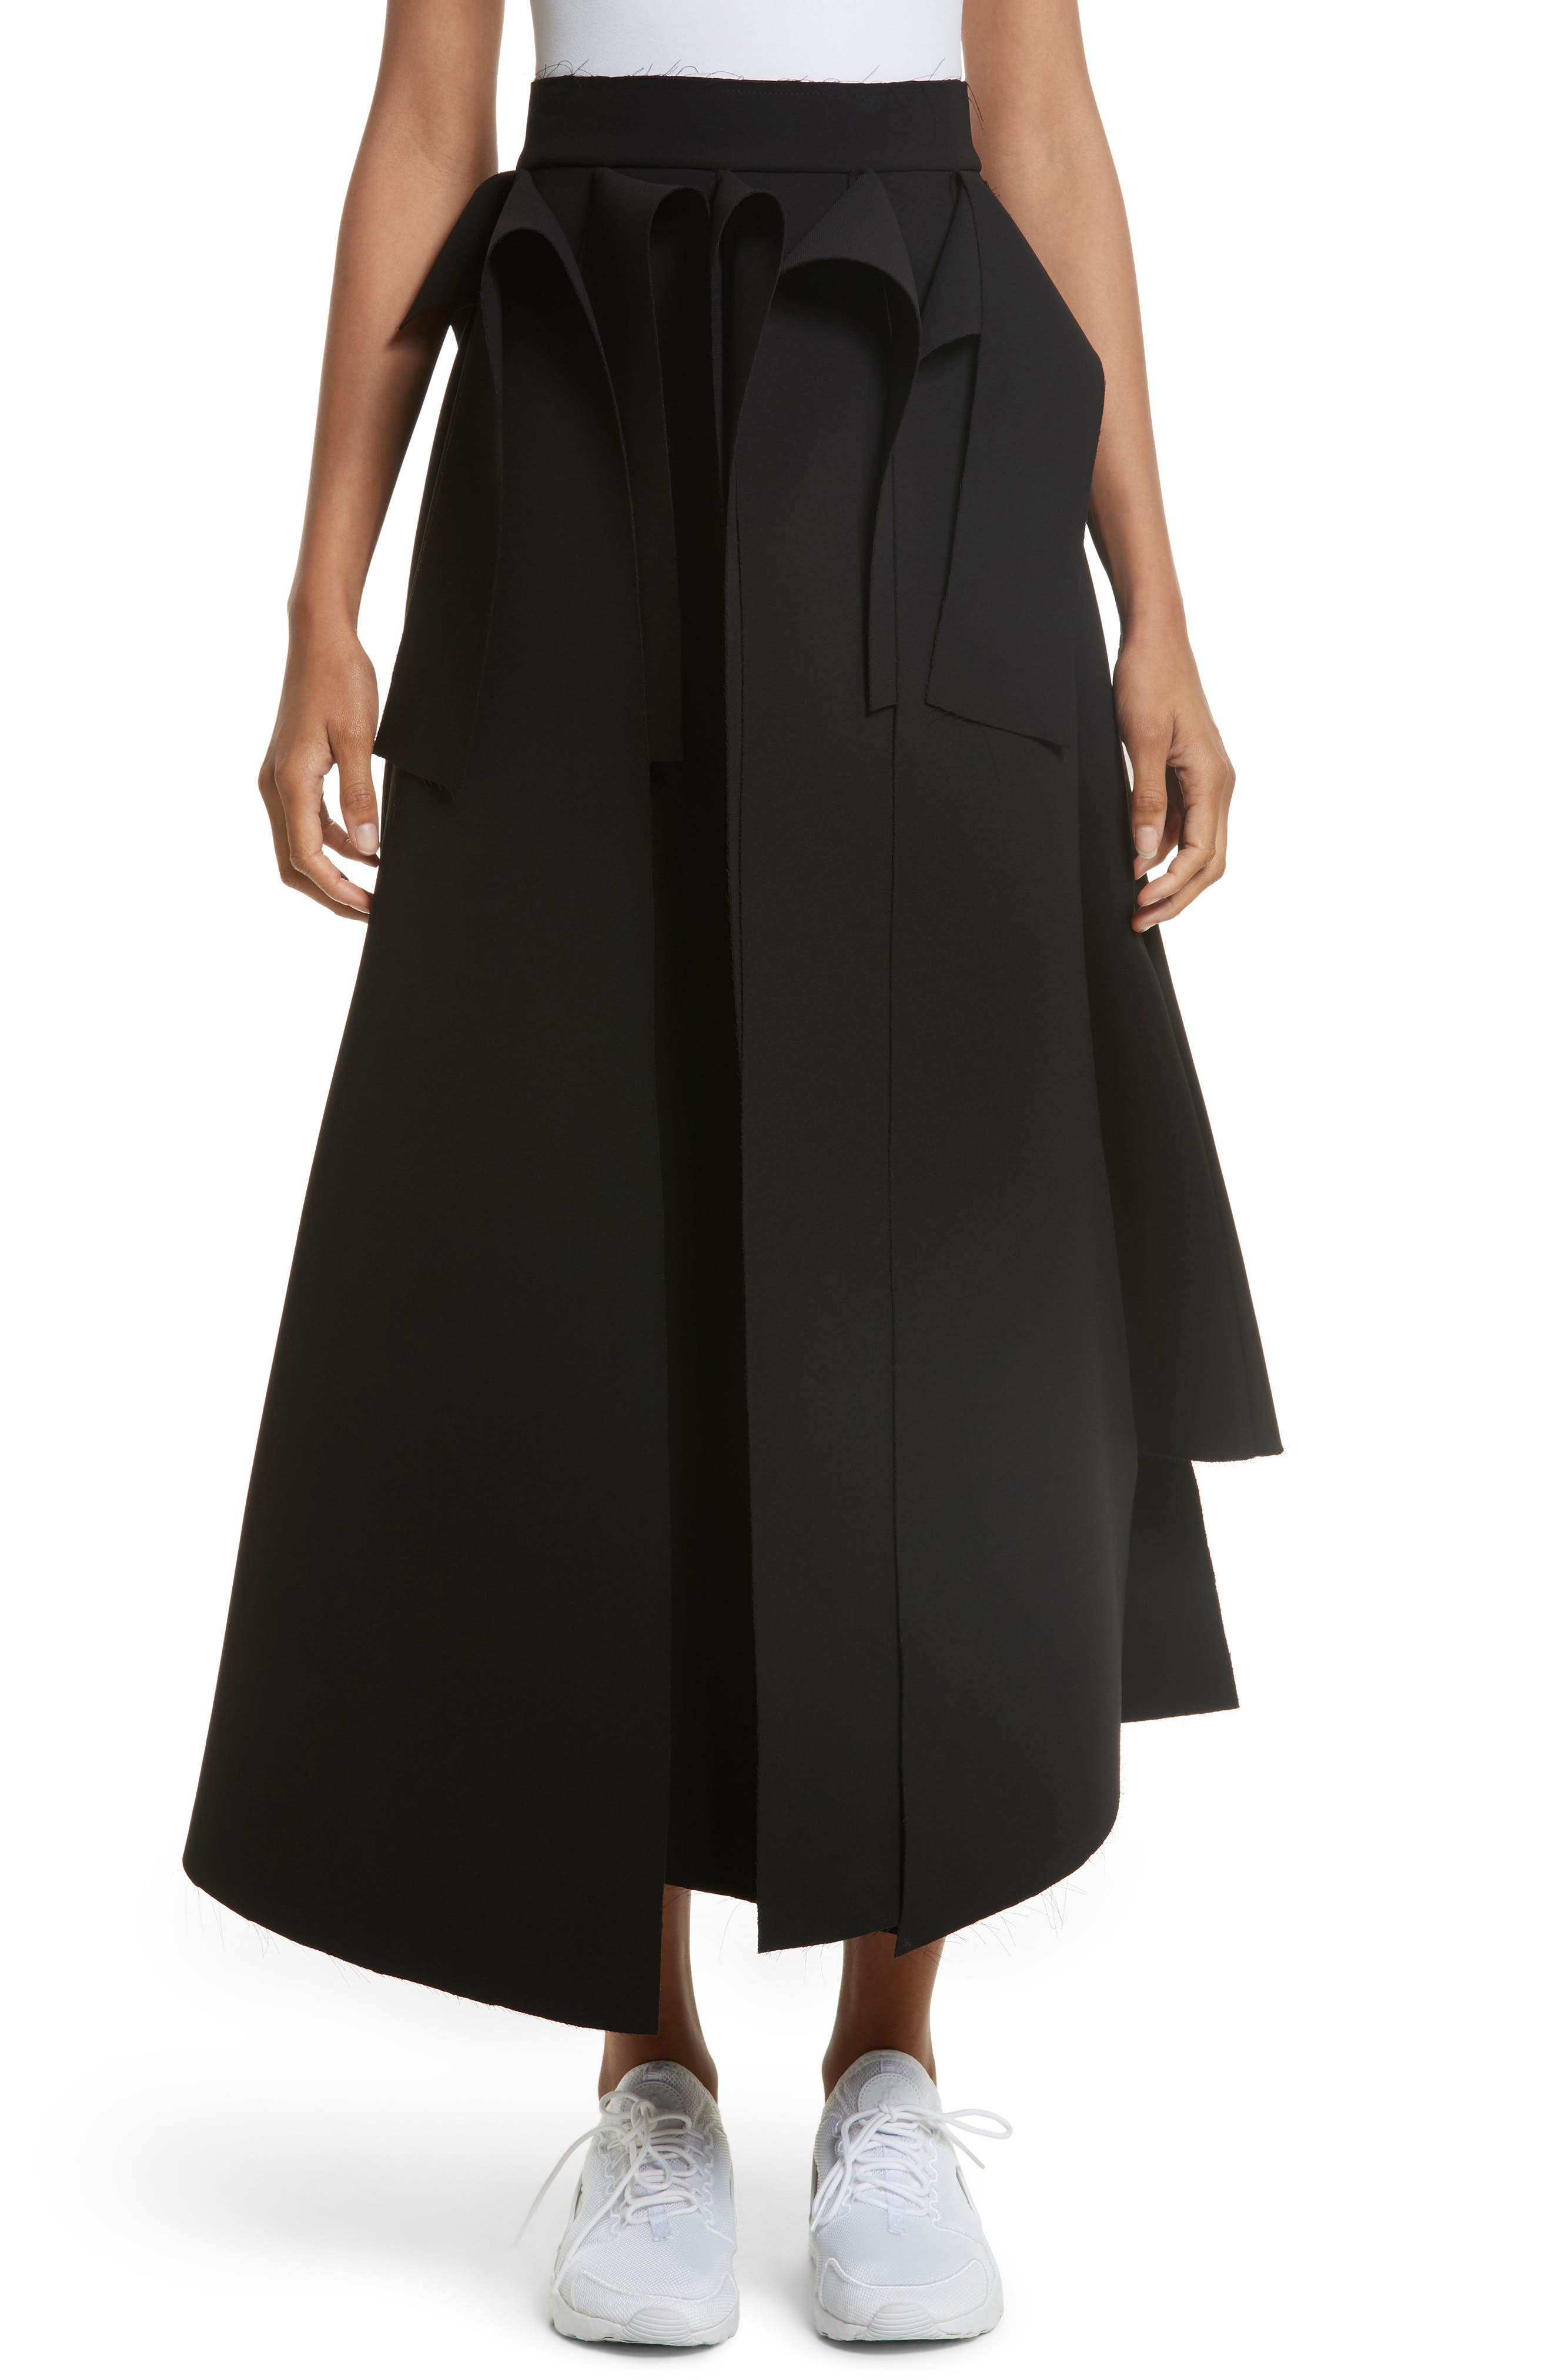 Alternate Image 1 Selected - A.W.A.K.E. Asymmetric Panel Skirt